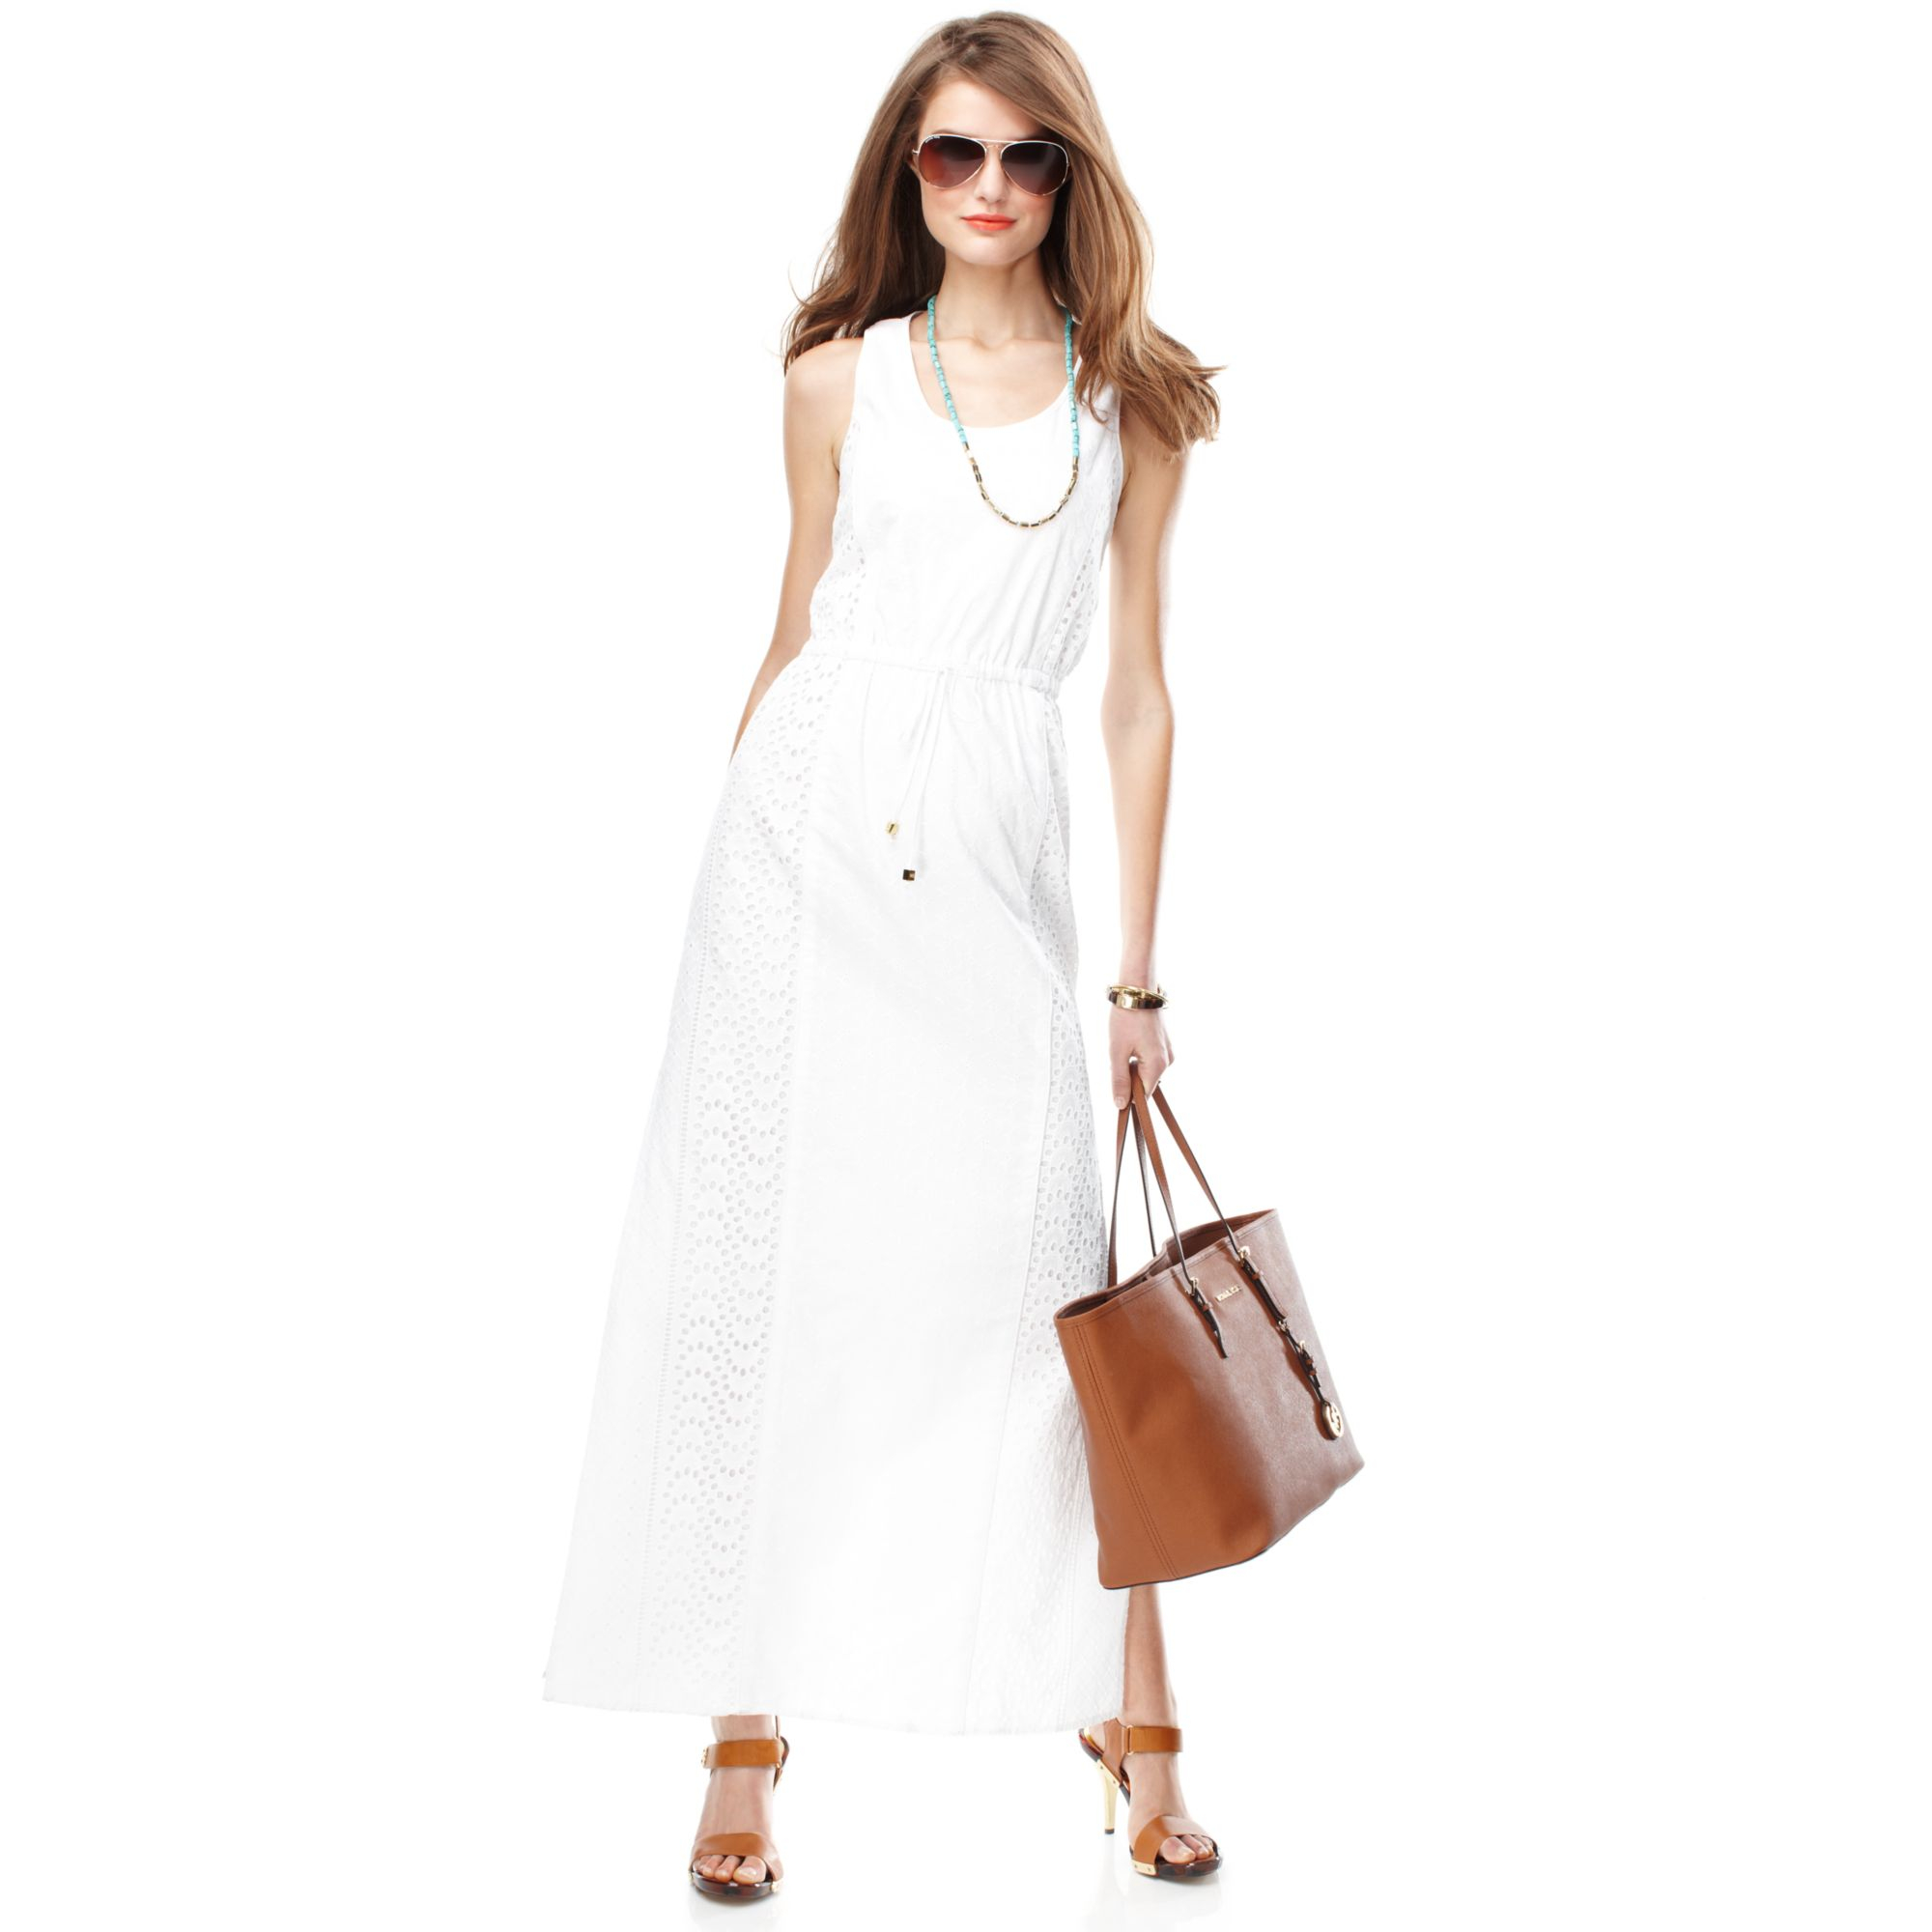 e7a1e60e434 Lyst - Michael Kors Michael Sleeveless Cotton Eyelet Maxi Dress in White